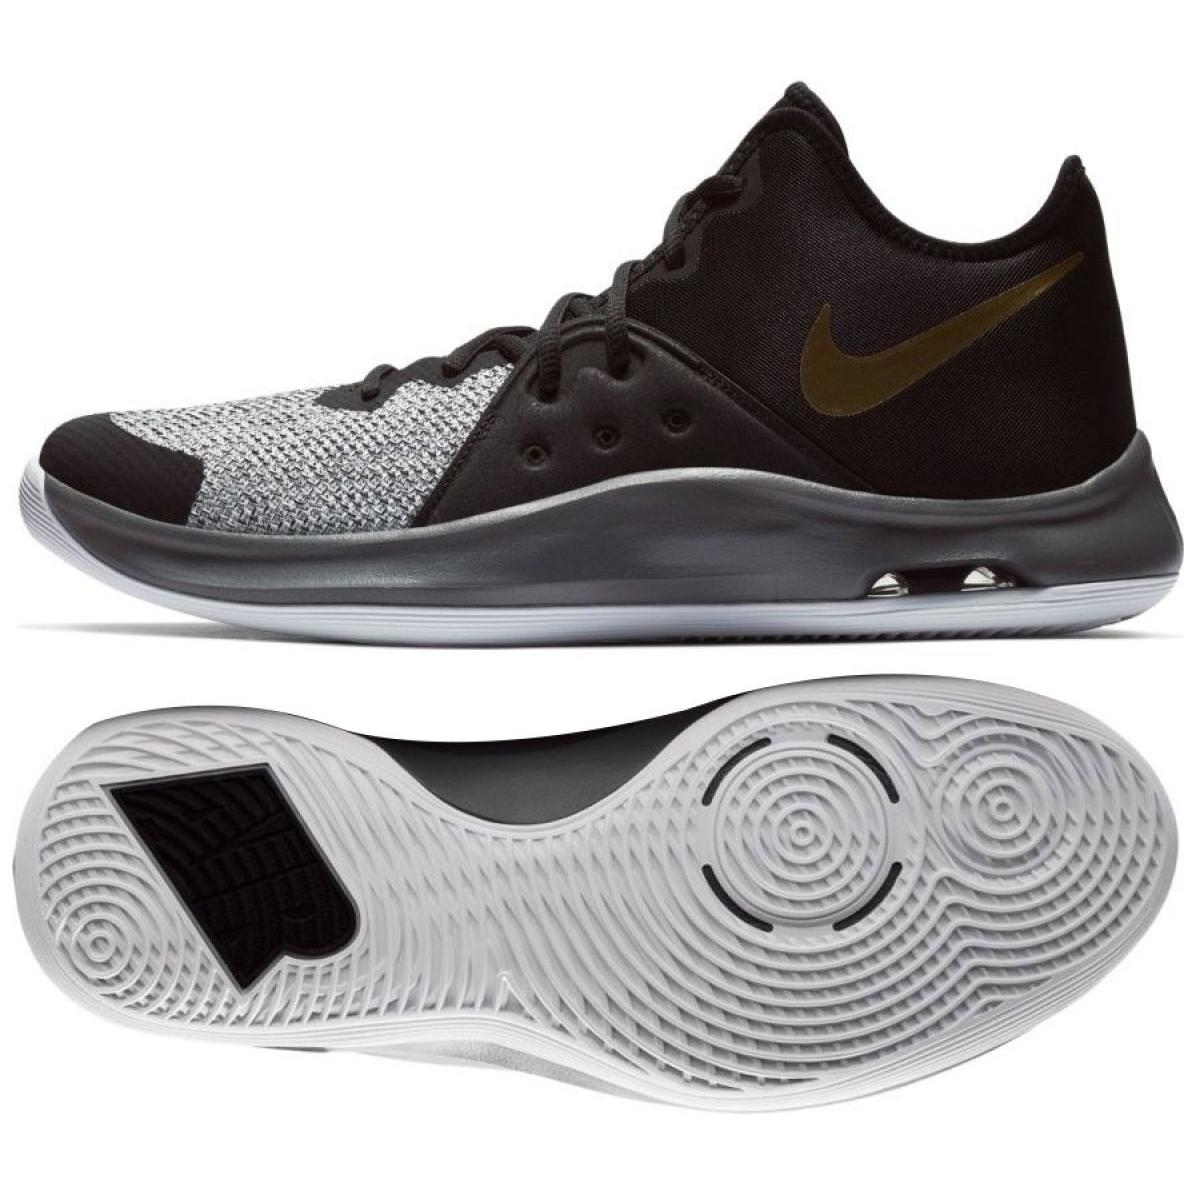 Kosárlabda cipő Nike Air Versitile Iii M AO4430 005 fekete fekete